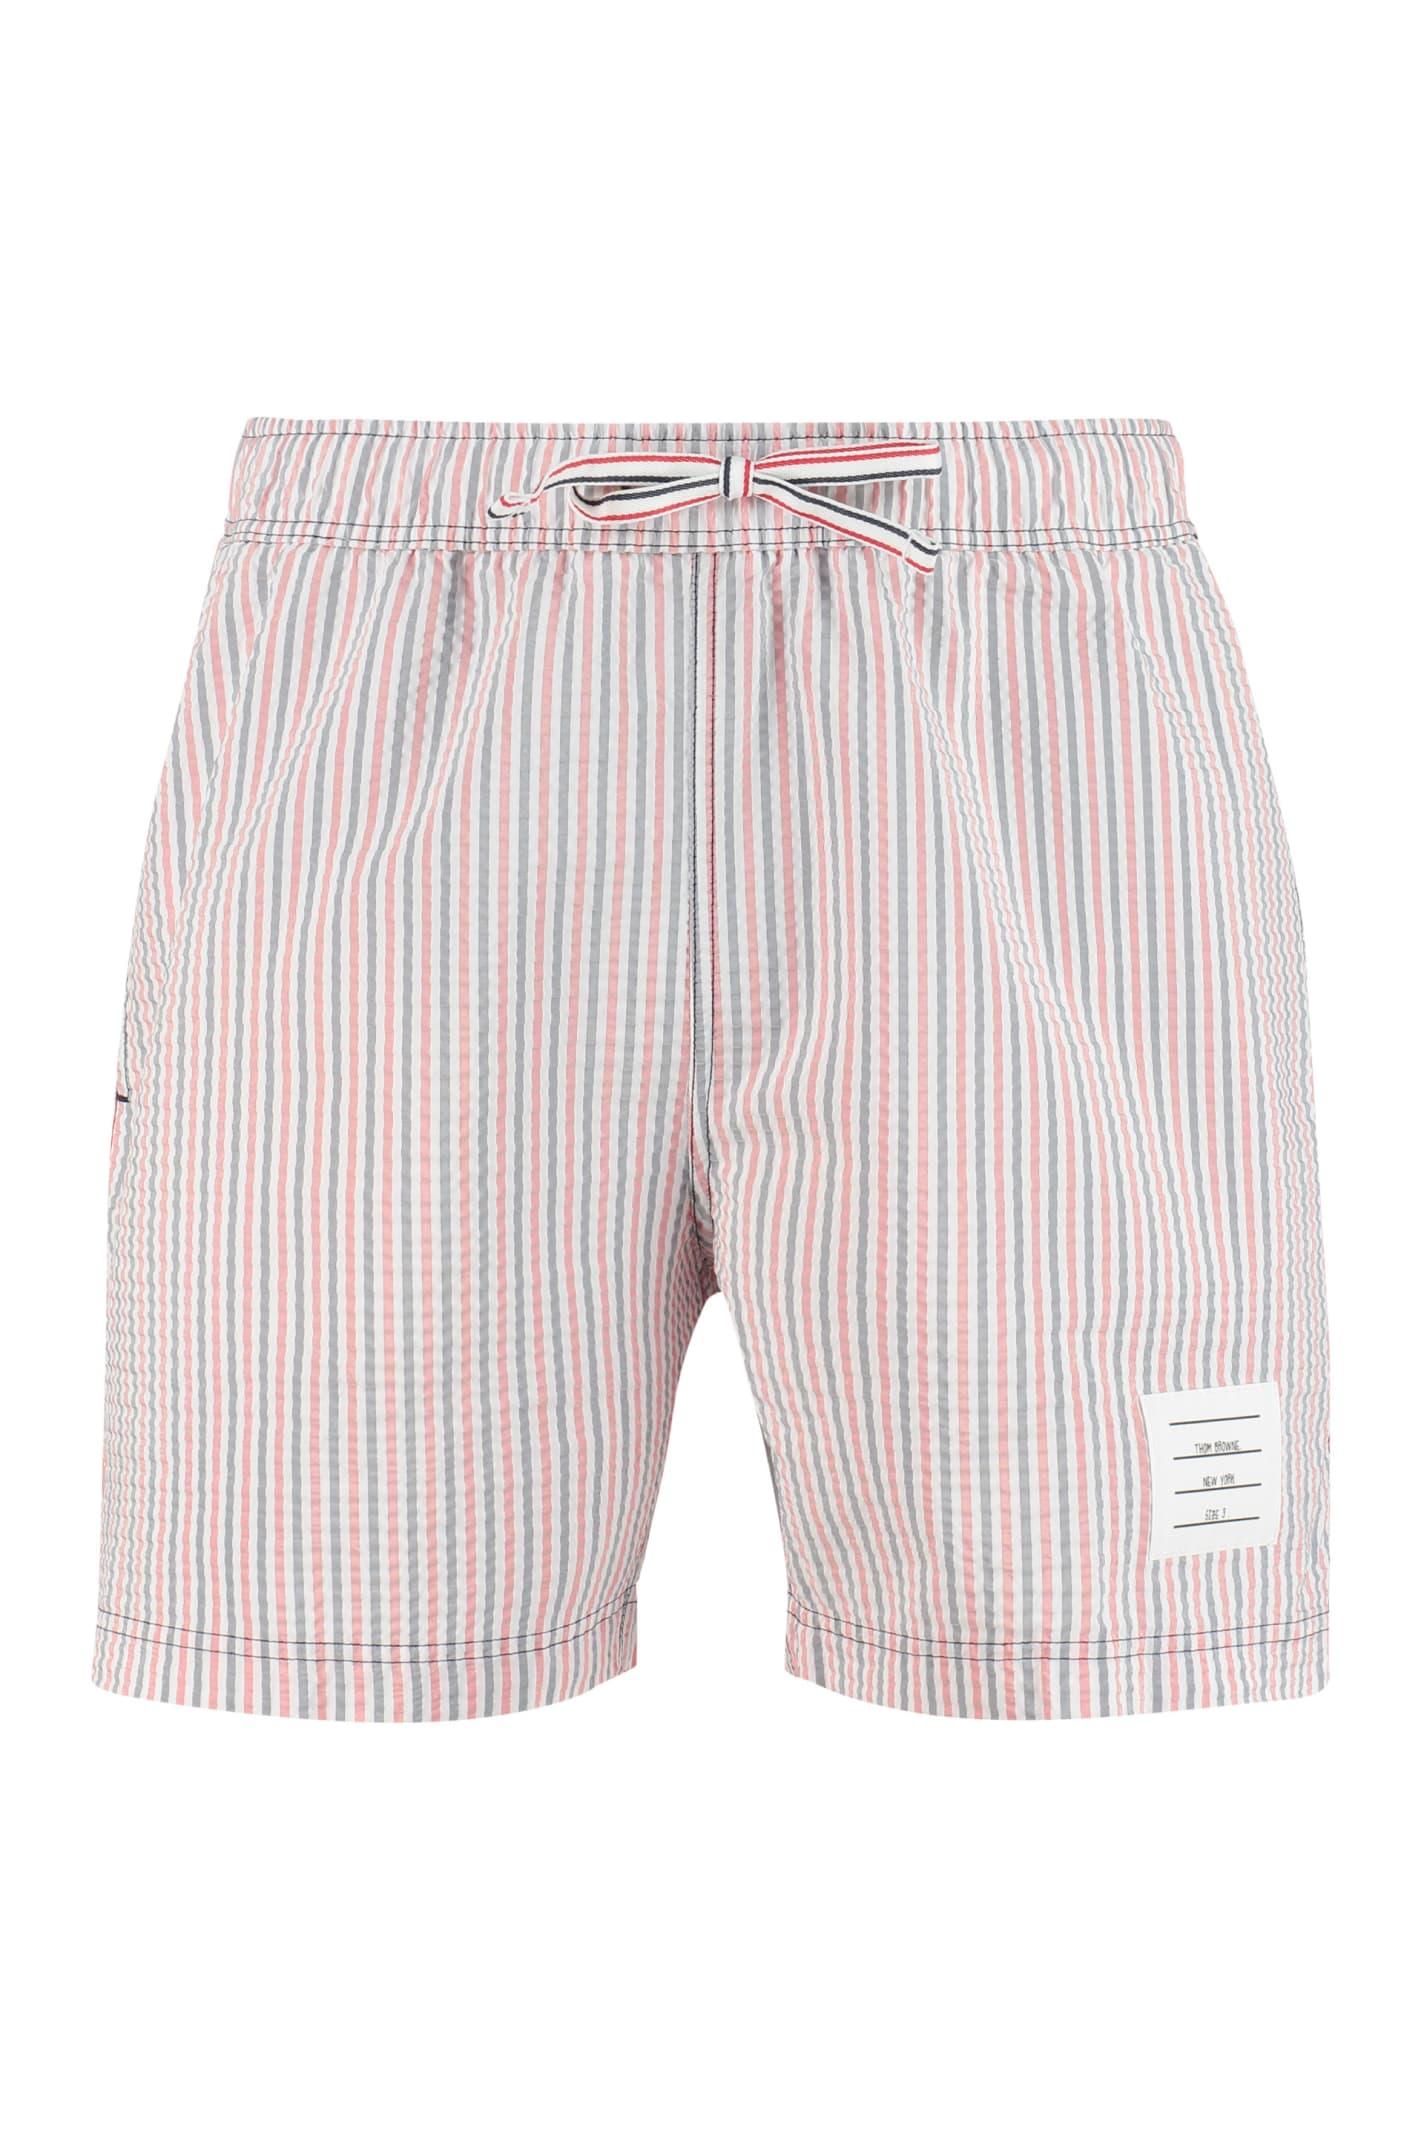 Thom Browne Shorts STRIPED SWIM SHORTS